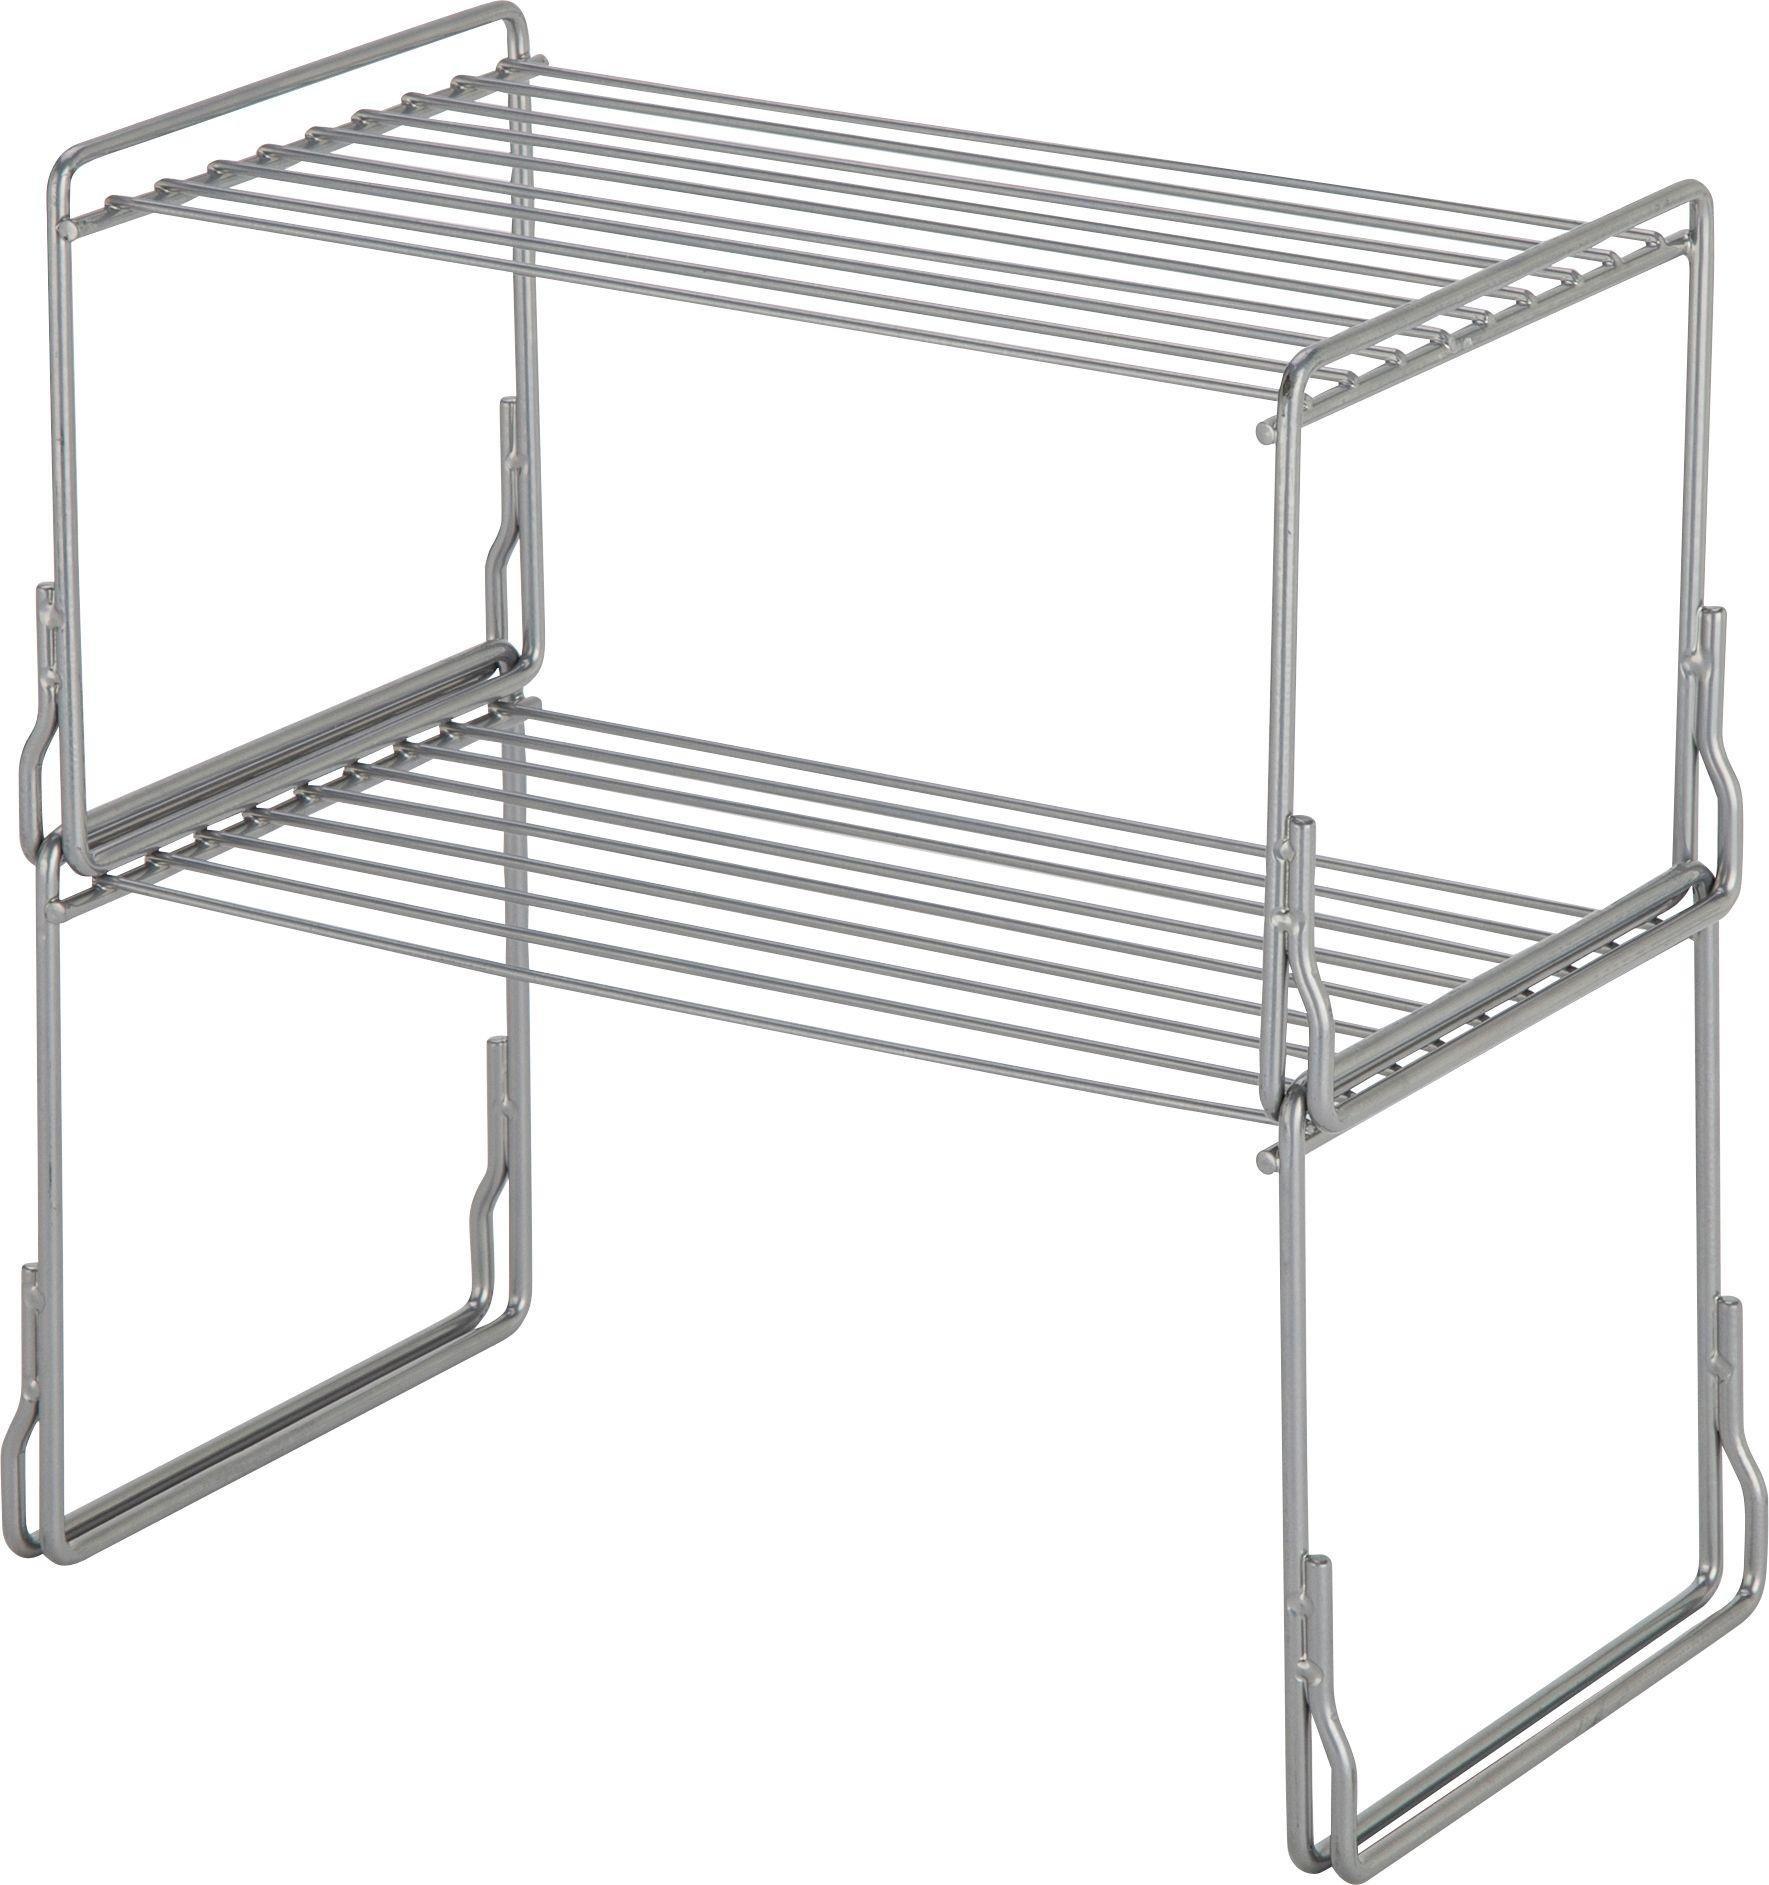 home steel cupboard storage solution racks shelves and stands   argos  rh   argos co uk